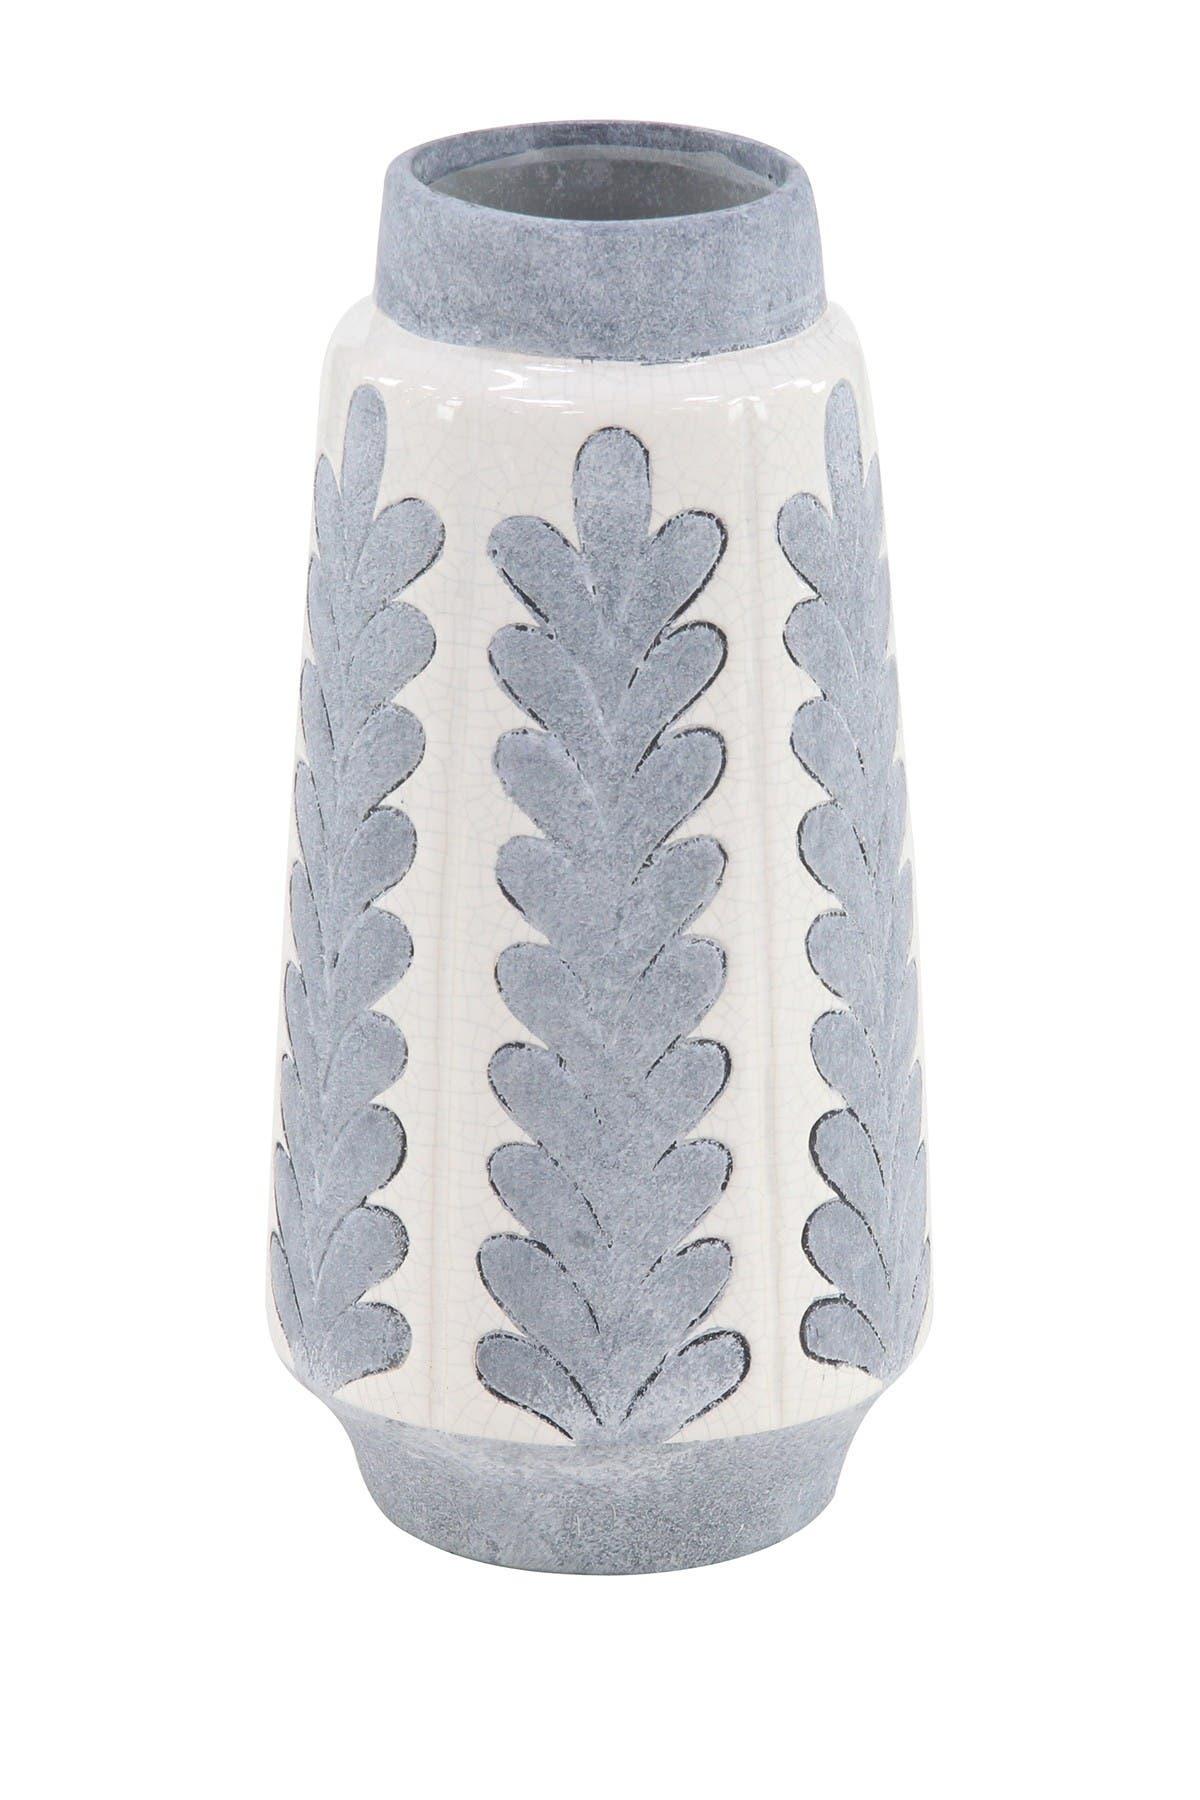 "Image of Willow Row Natural 14"" x 7"" Gray Stoneware Decorative Vase"